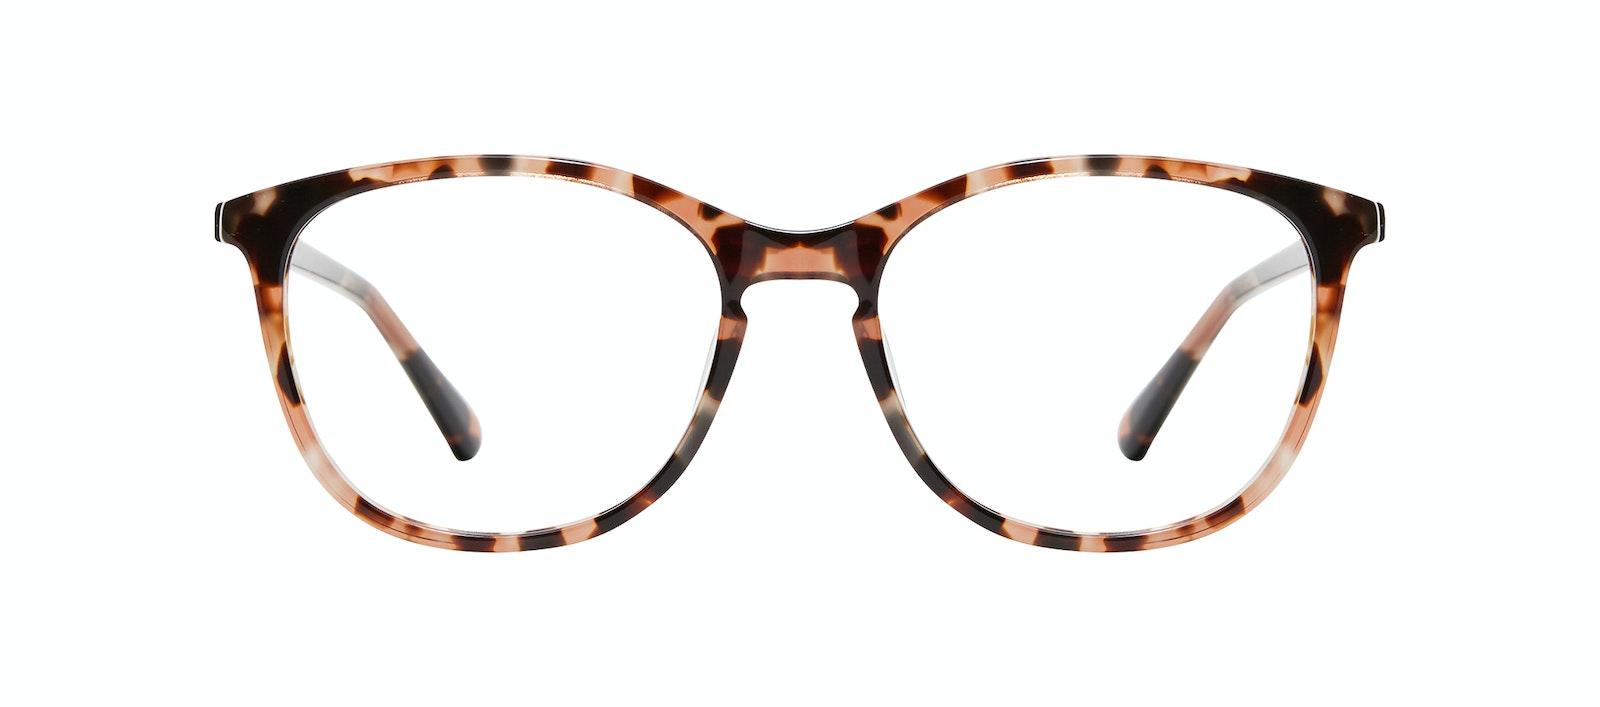 Affordable Fashion Glasses Rectangle Square Round Eyeglasses Women Nadine S Pink Tortoise Front